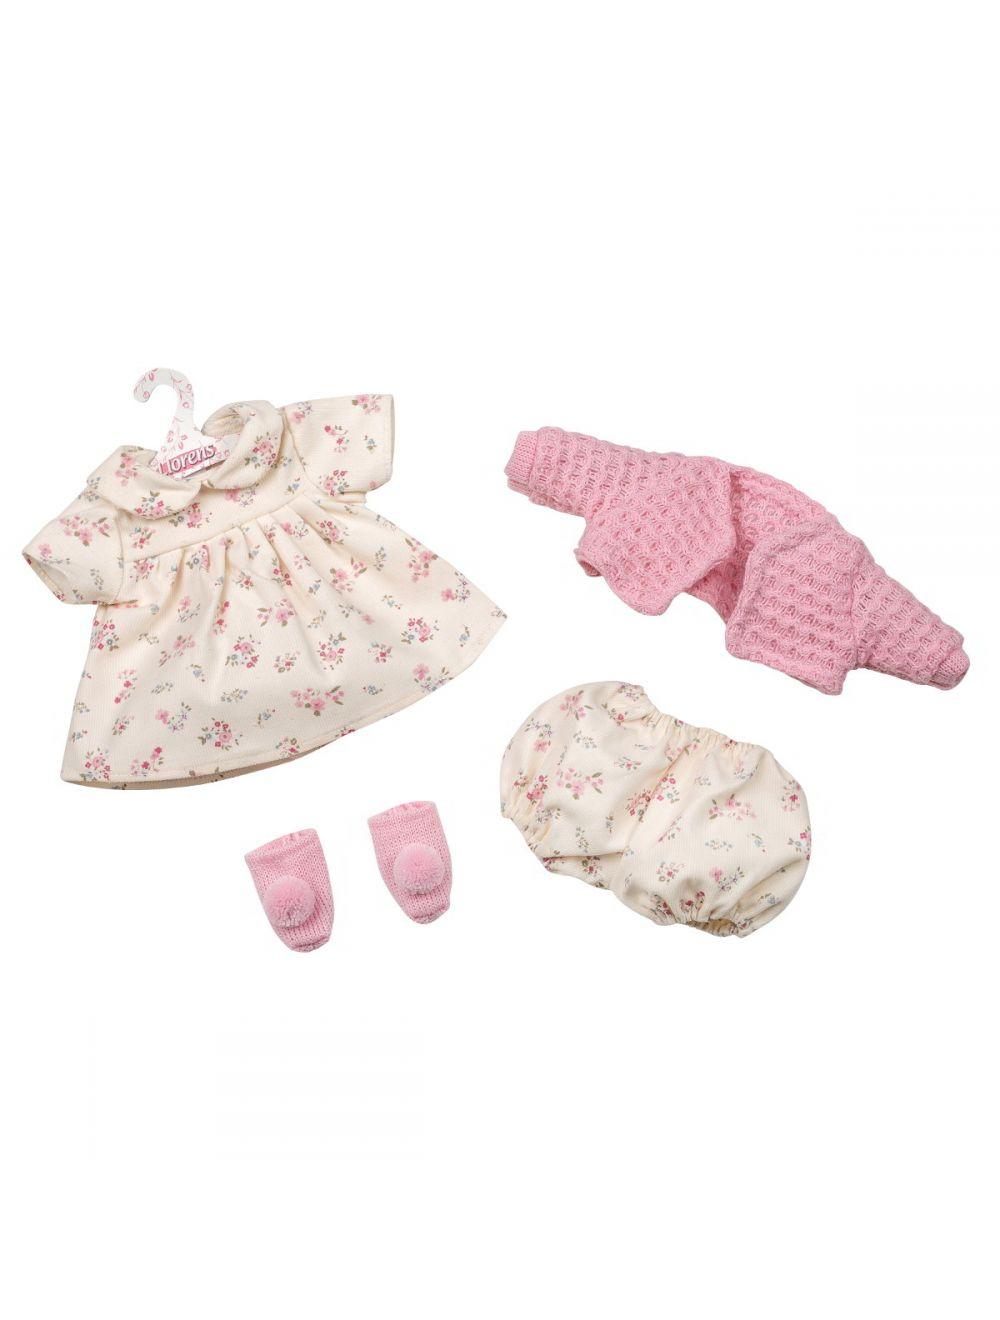 Llorens ubranko dla lalki 33 cm mix wzorów